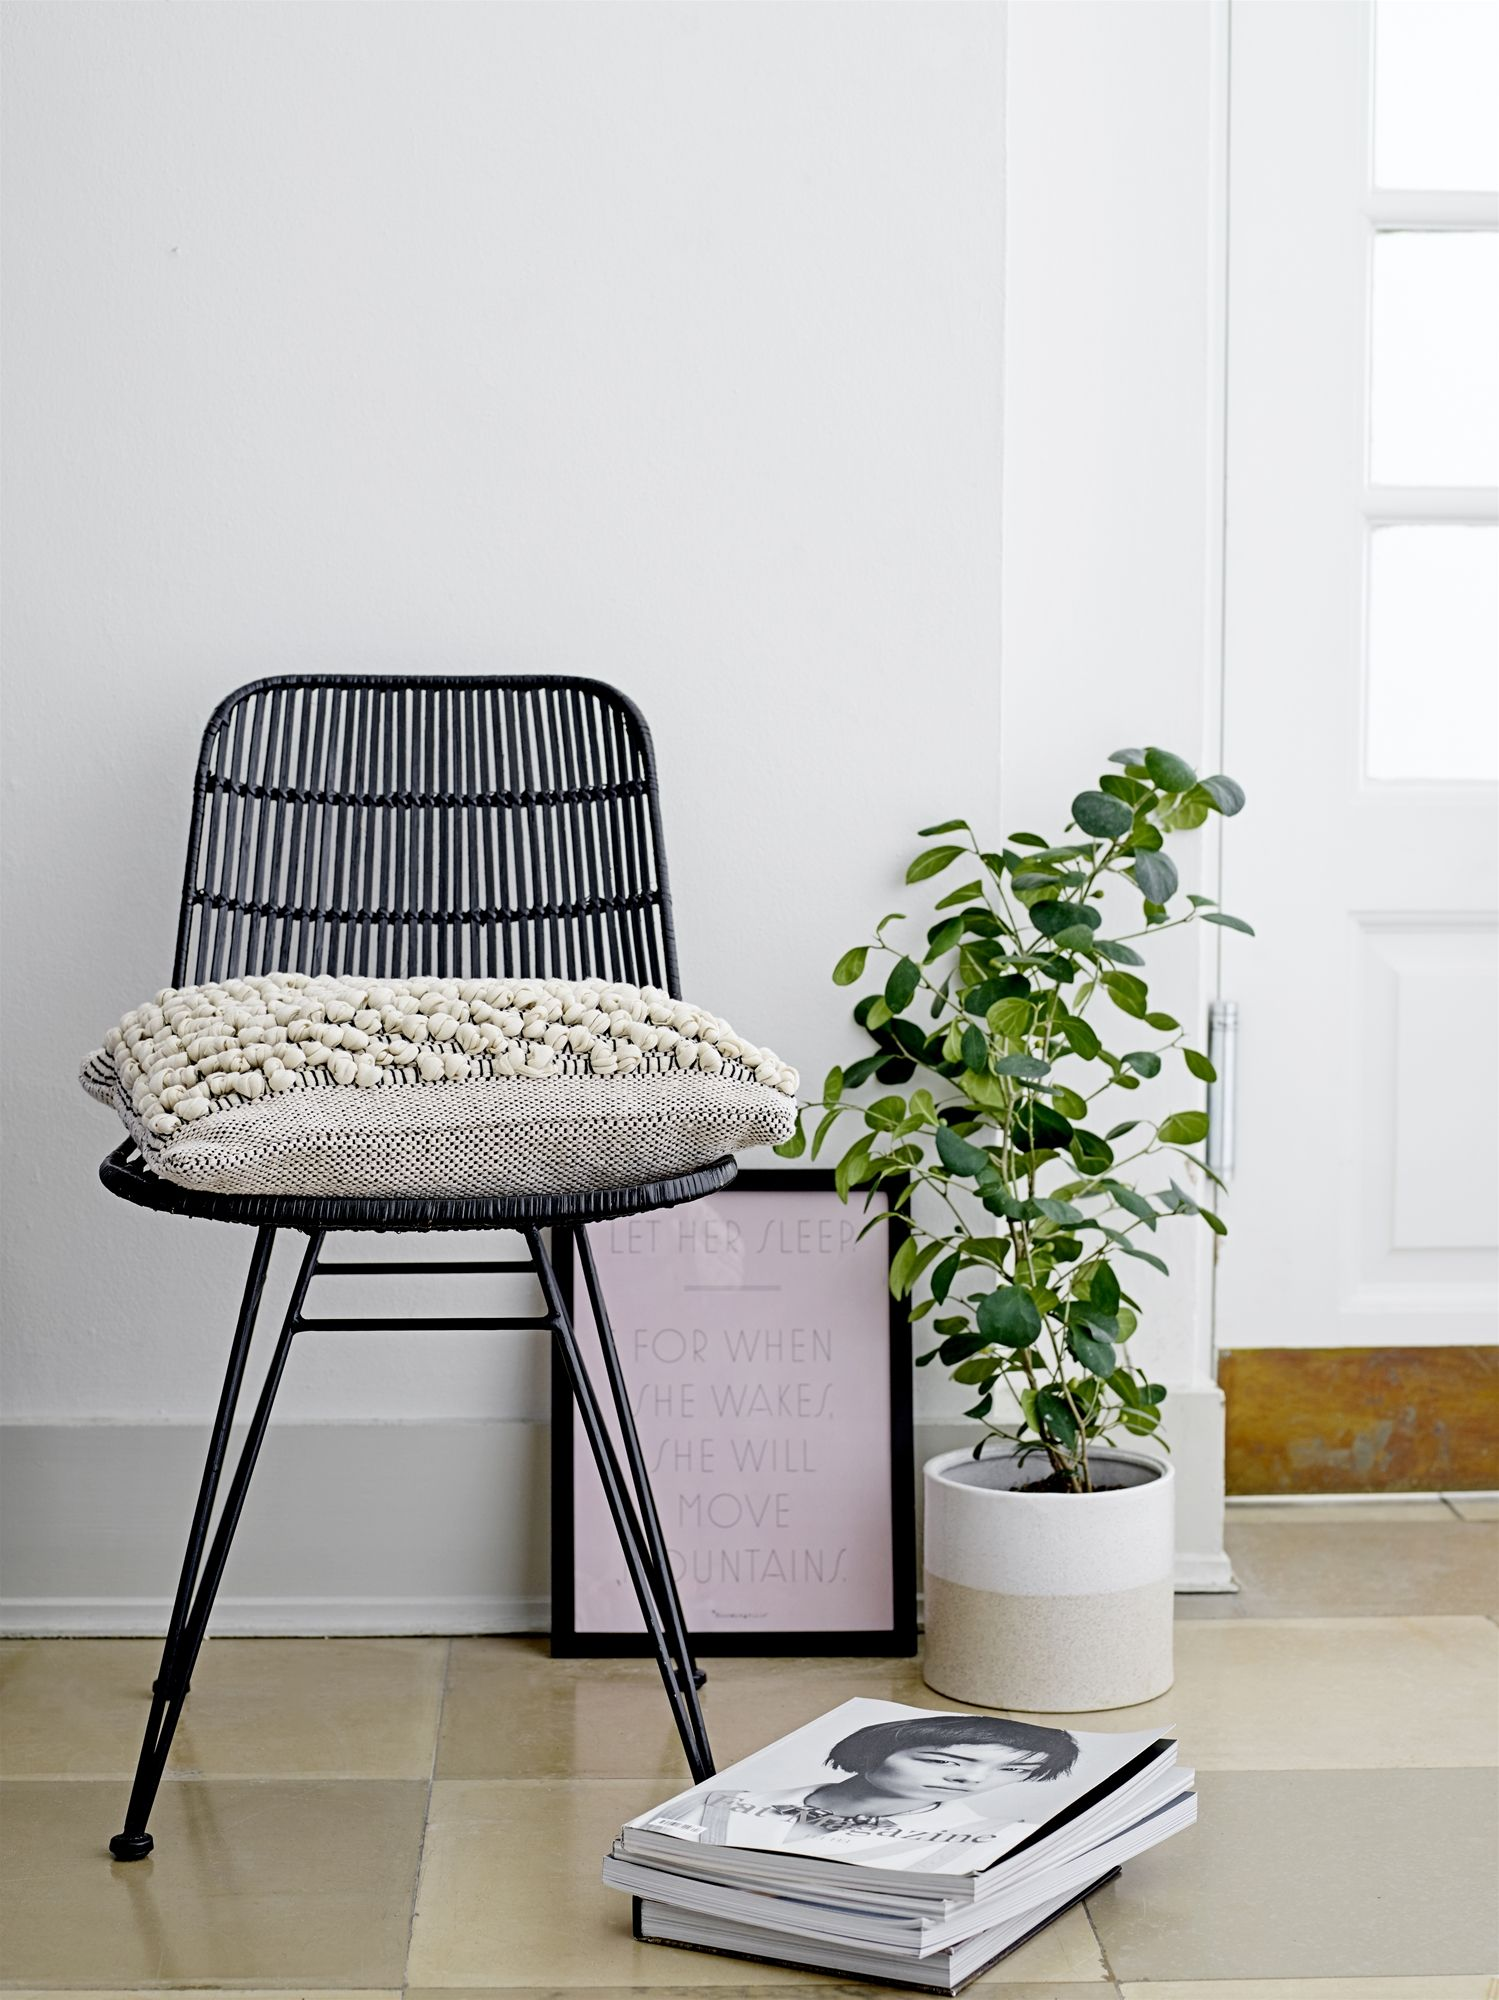 Noir En De 2 Lena Lot Rotin Bloomingville Chaises Rcbshqdoxt Chair uTlcK1F3J